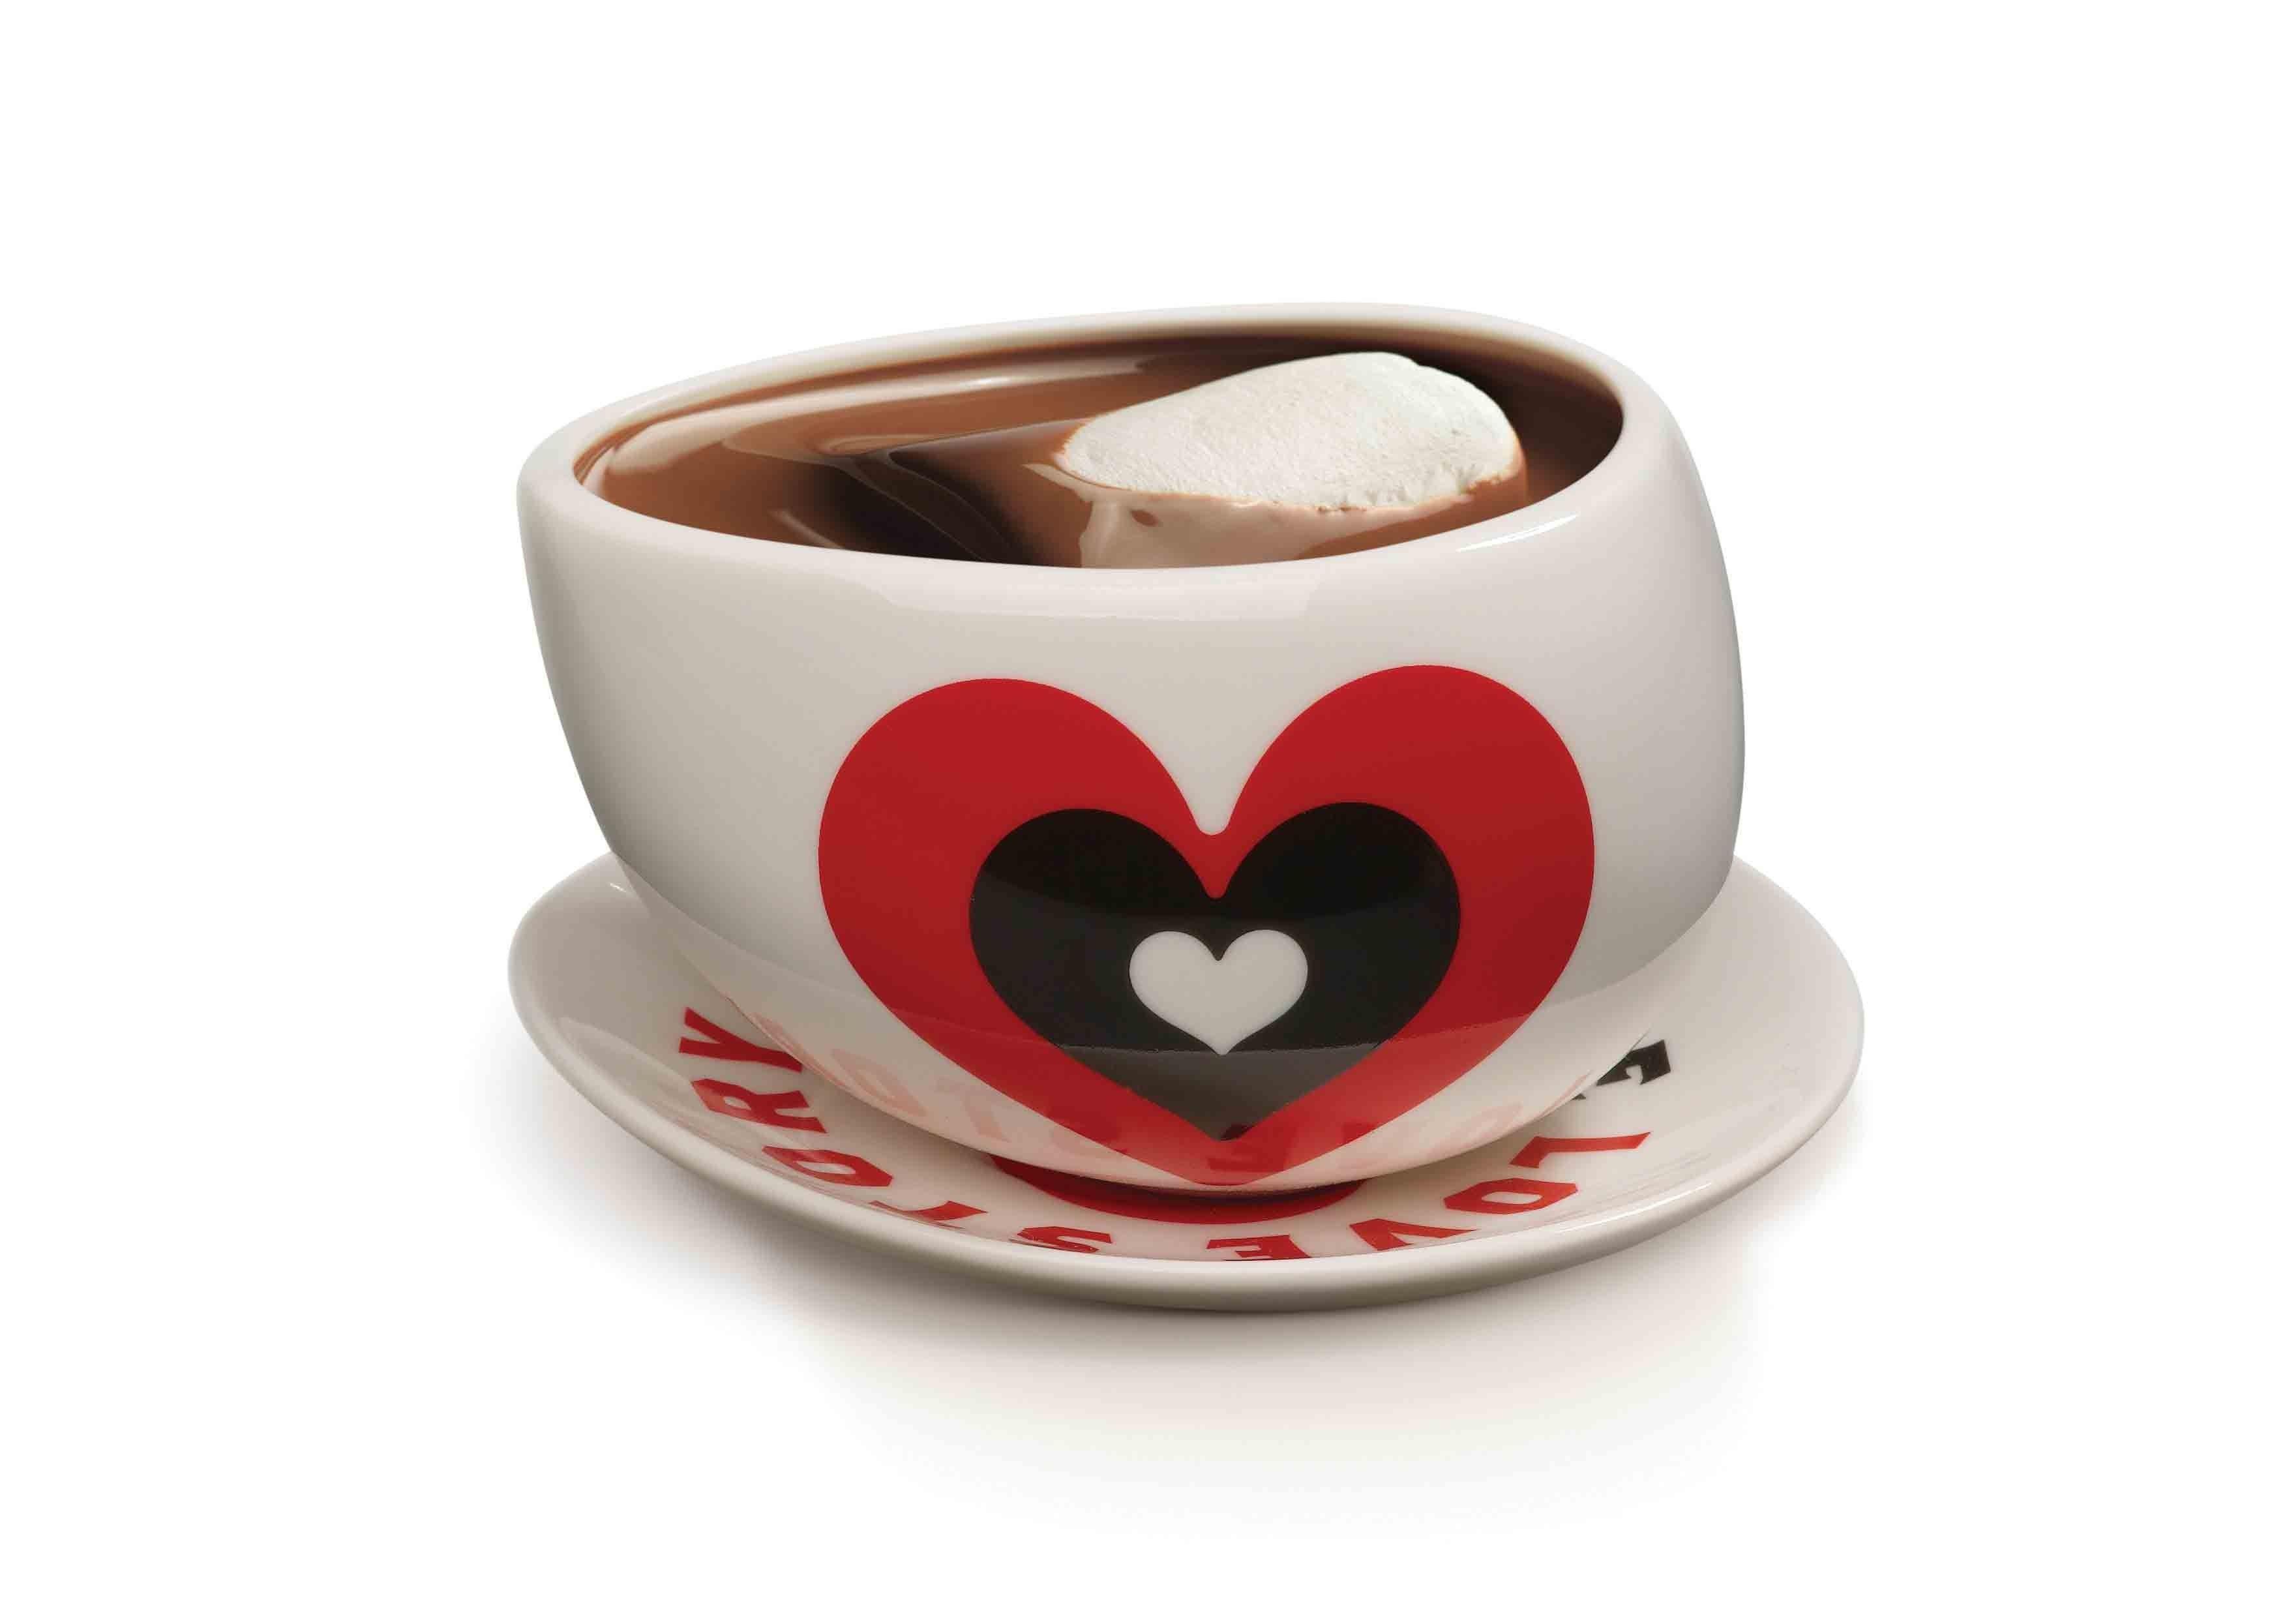 Love hug mug... I want one!